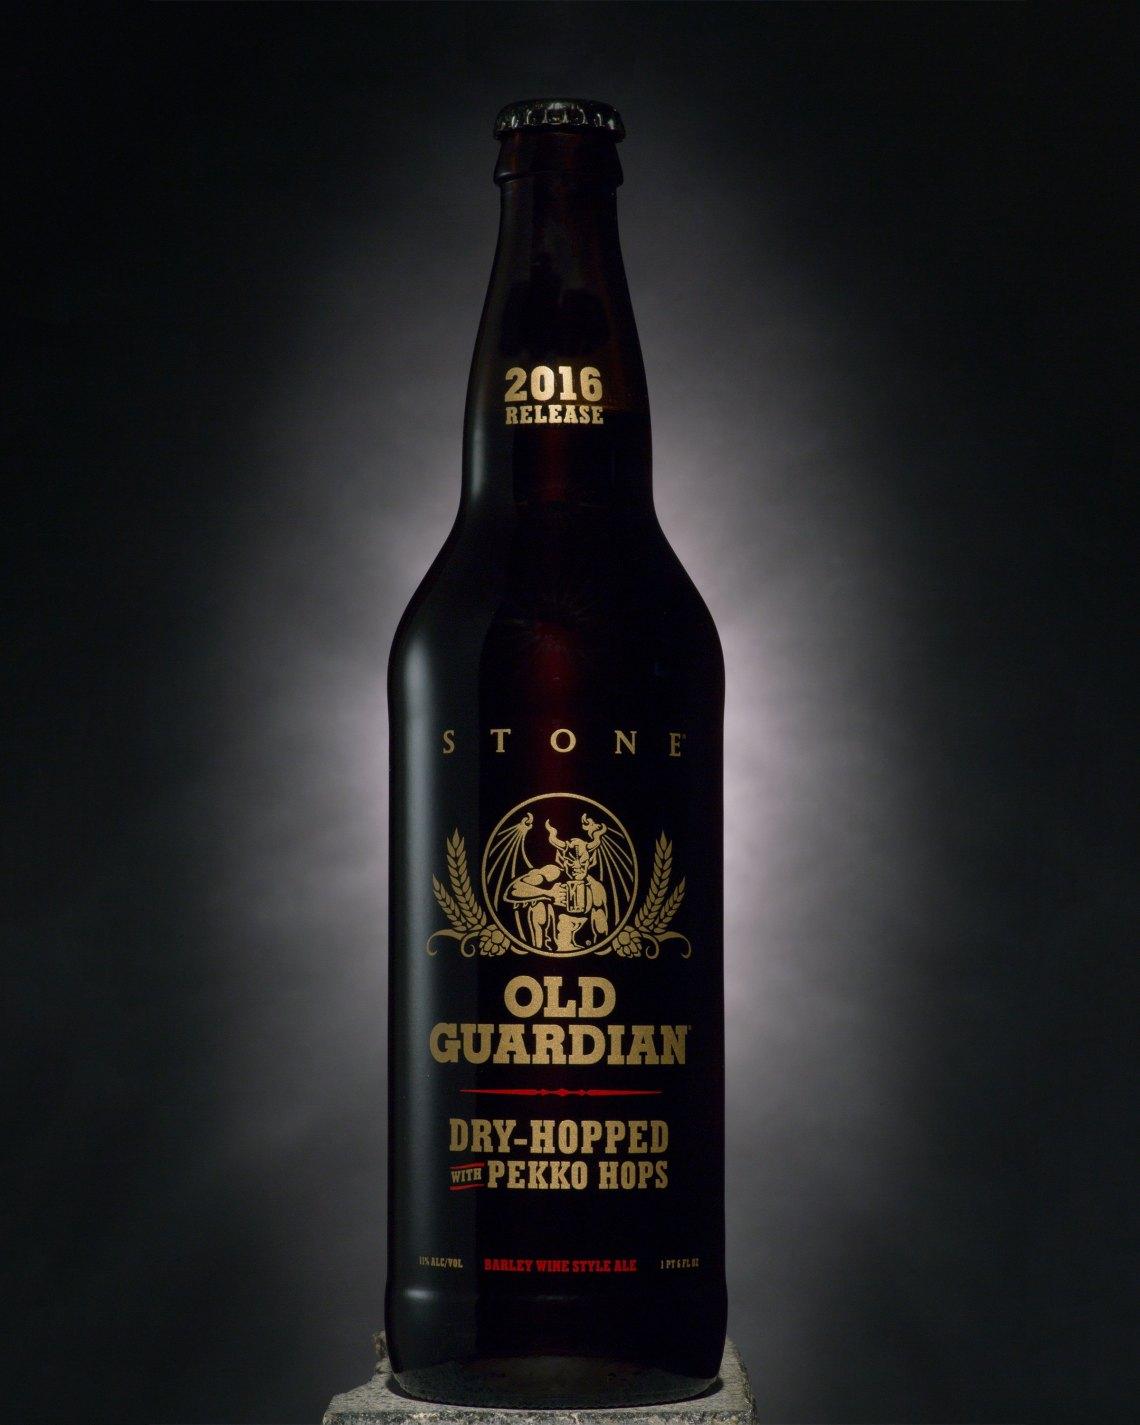 Stone Old Guardian Barley Wine Dry-Hopped with Pekko Hops 2016